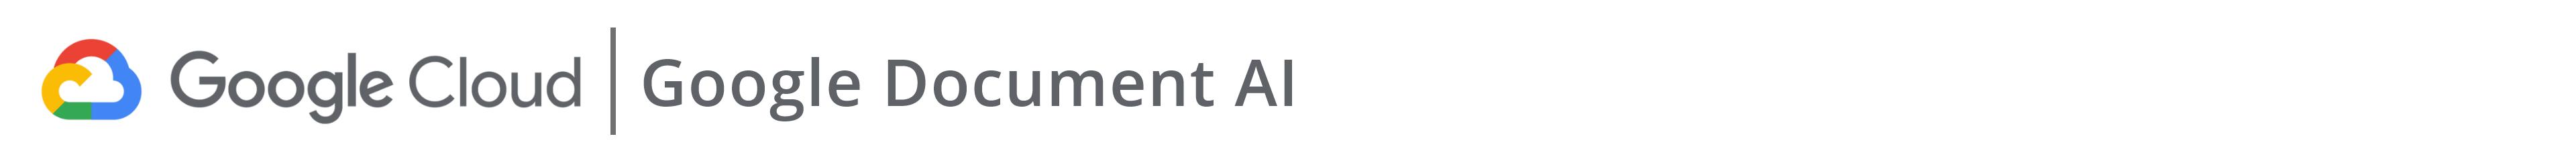 Google Document AI logo